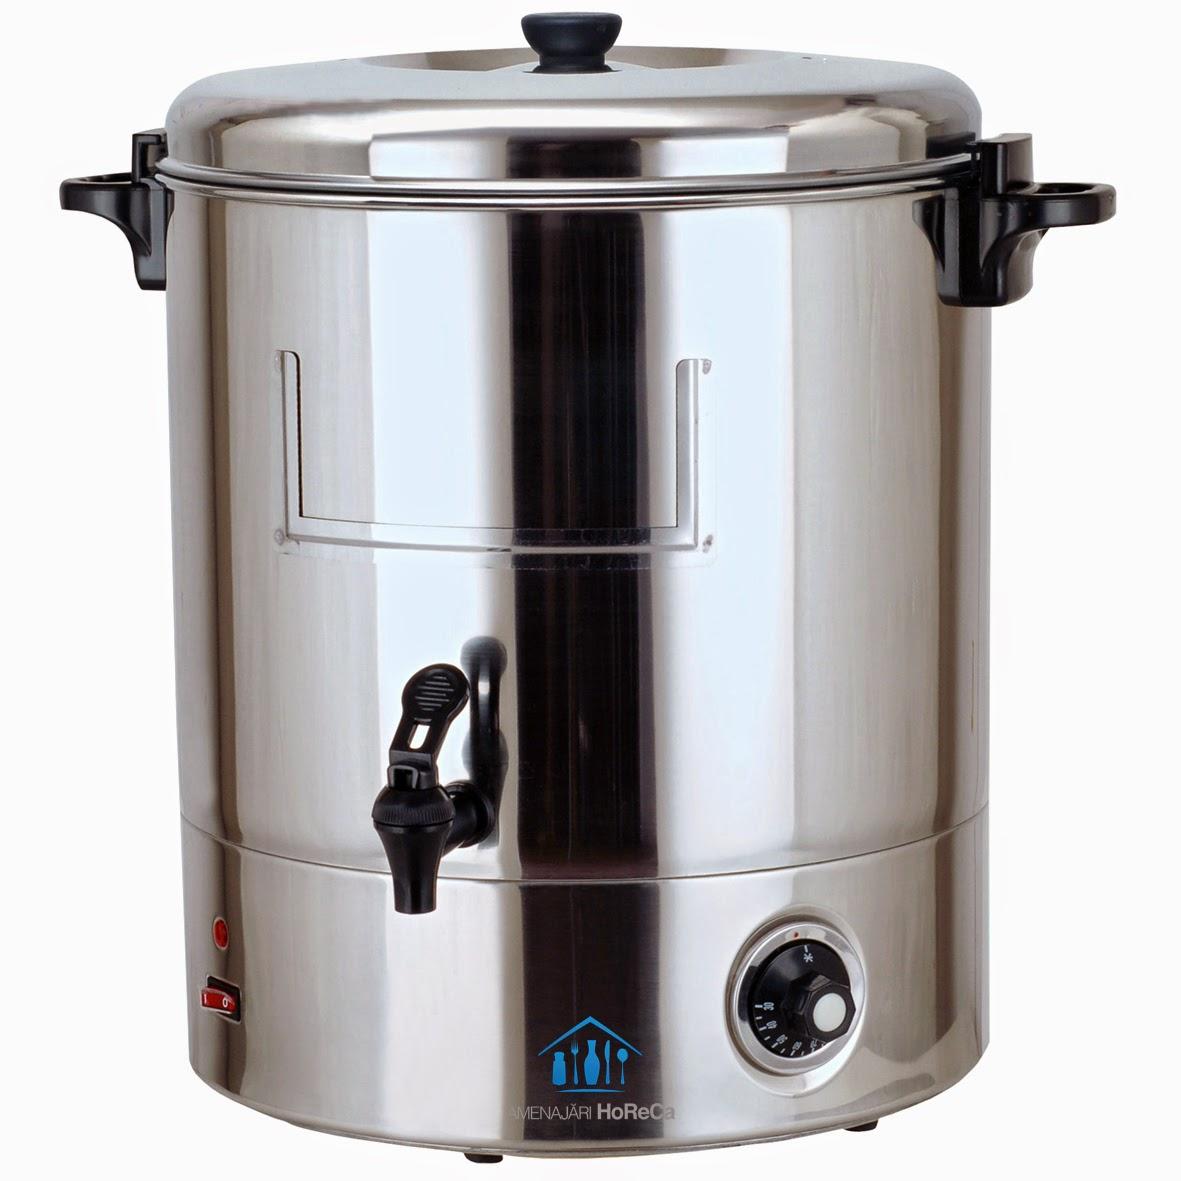 oala electrica,  finisaje standard, pereti dubli, pret, 30 litri, fierbator vin, aparat vin fiert, dozator vin fiert, dozator apa fierbinte, aparat ceai